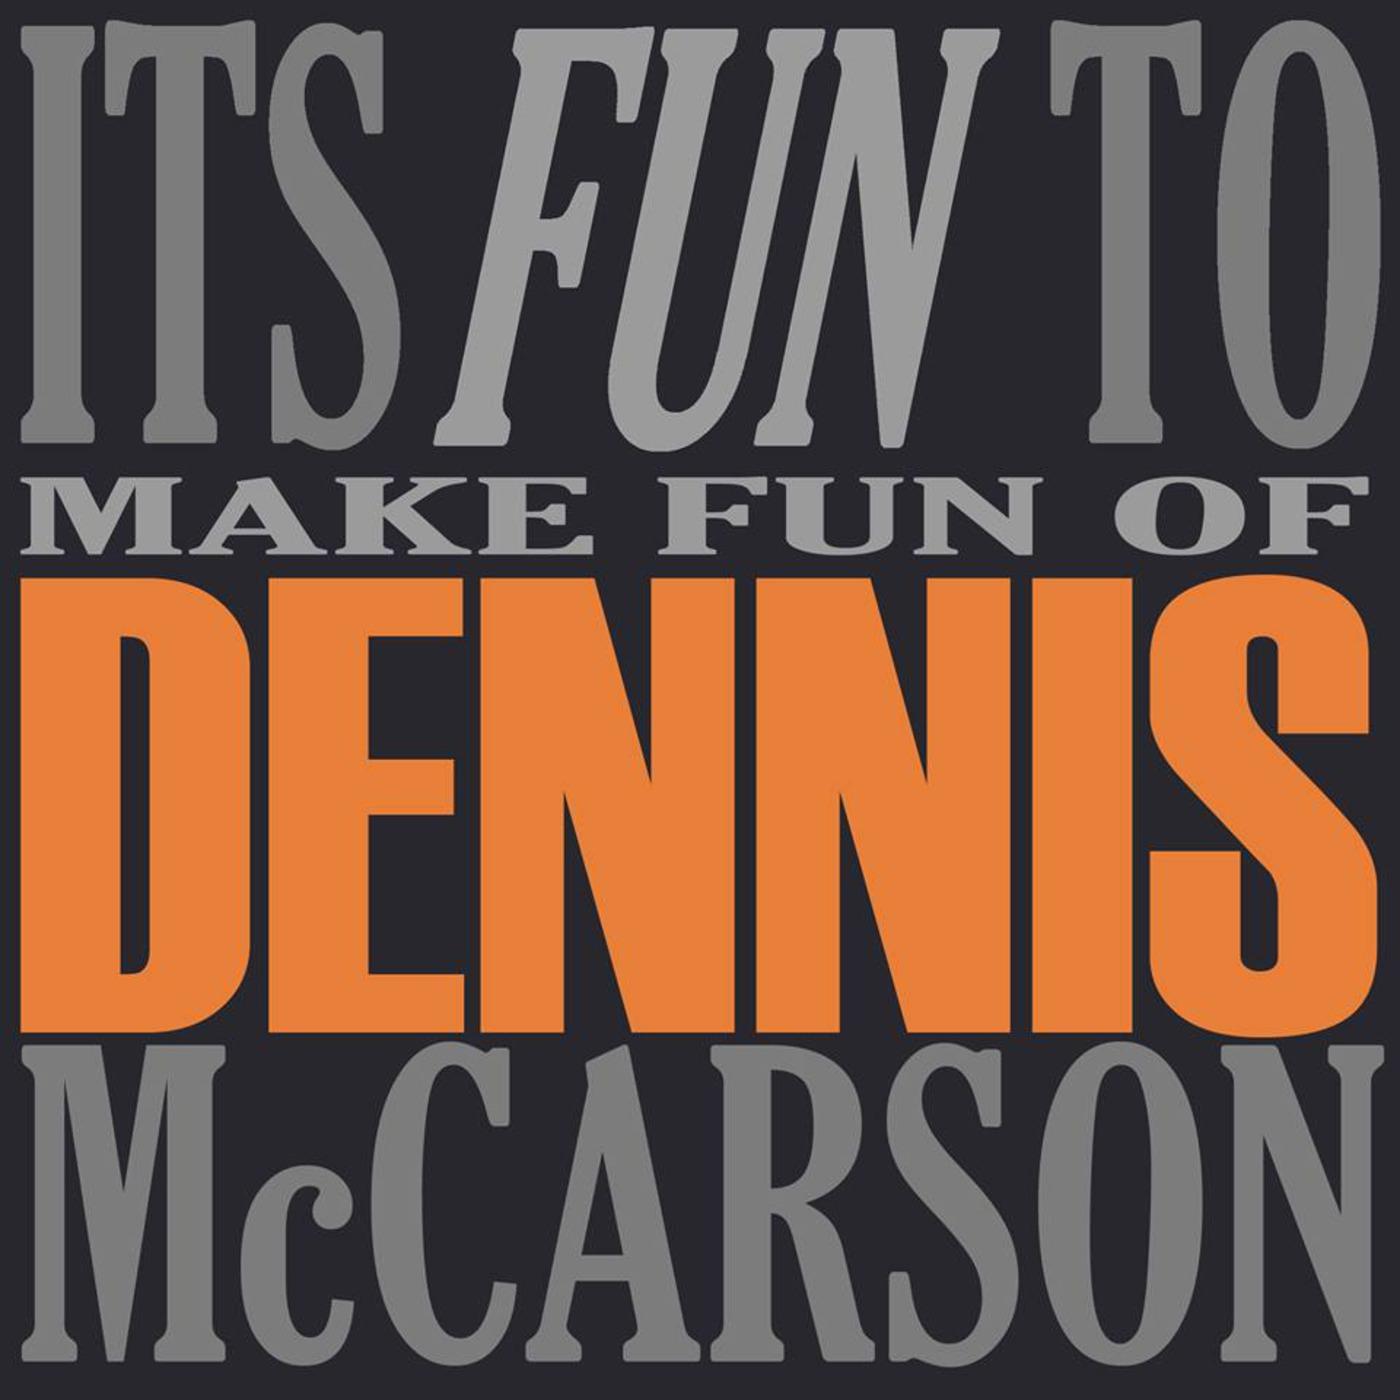 It's Fun To Make Fun Of Dennis McCarson